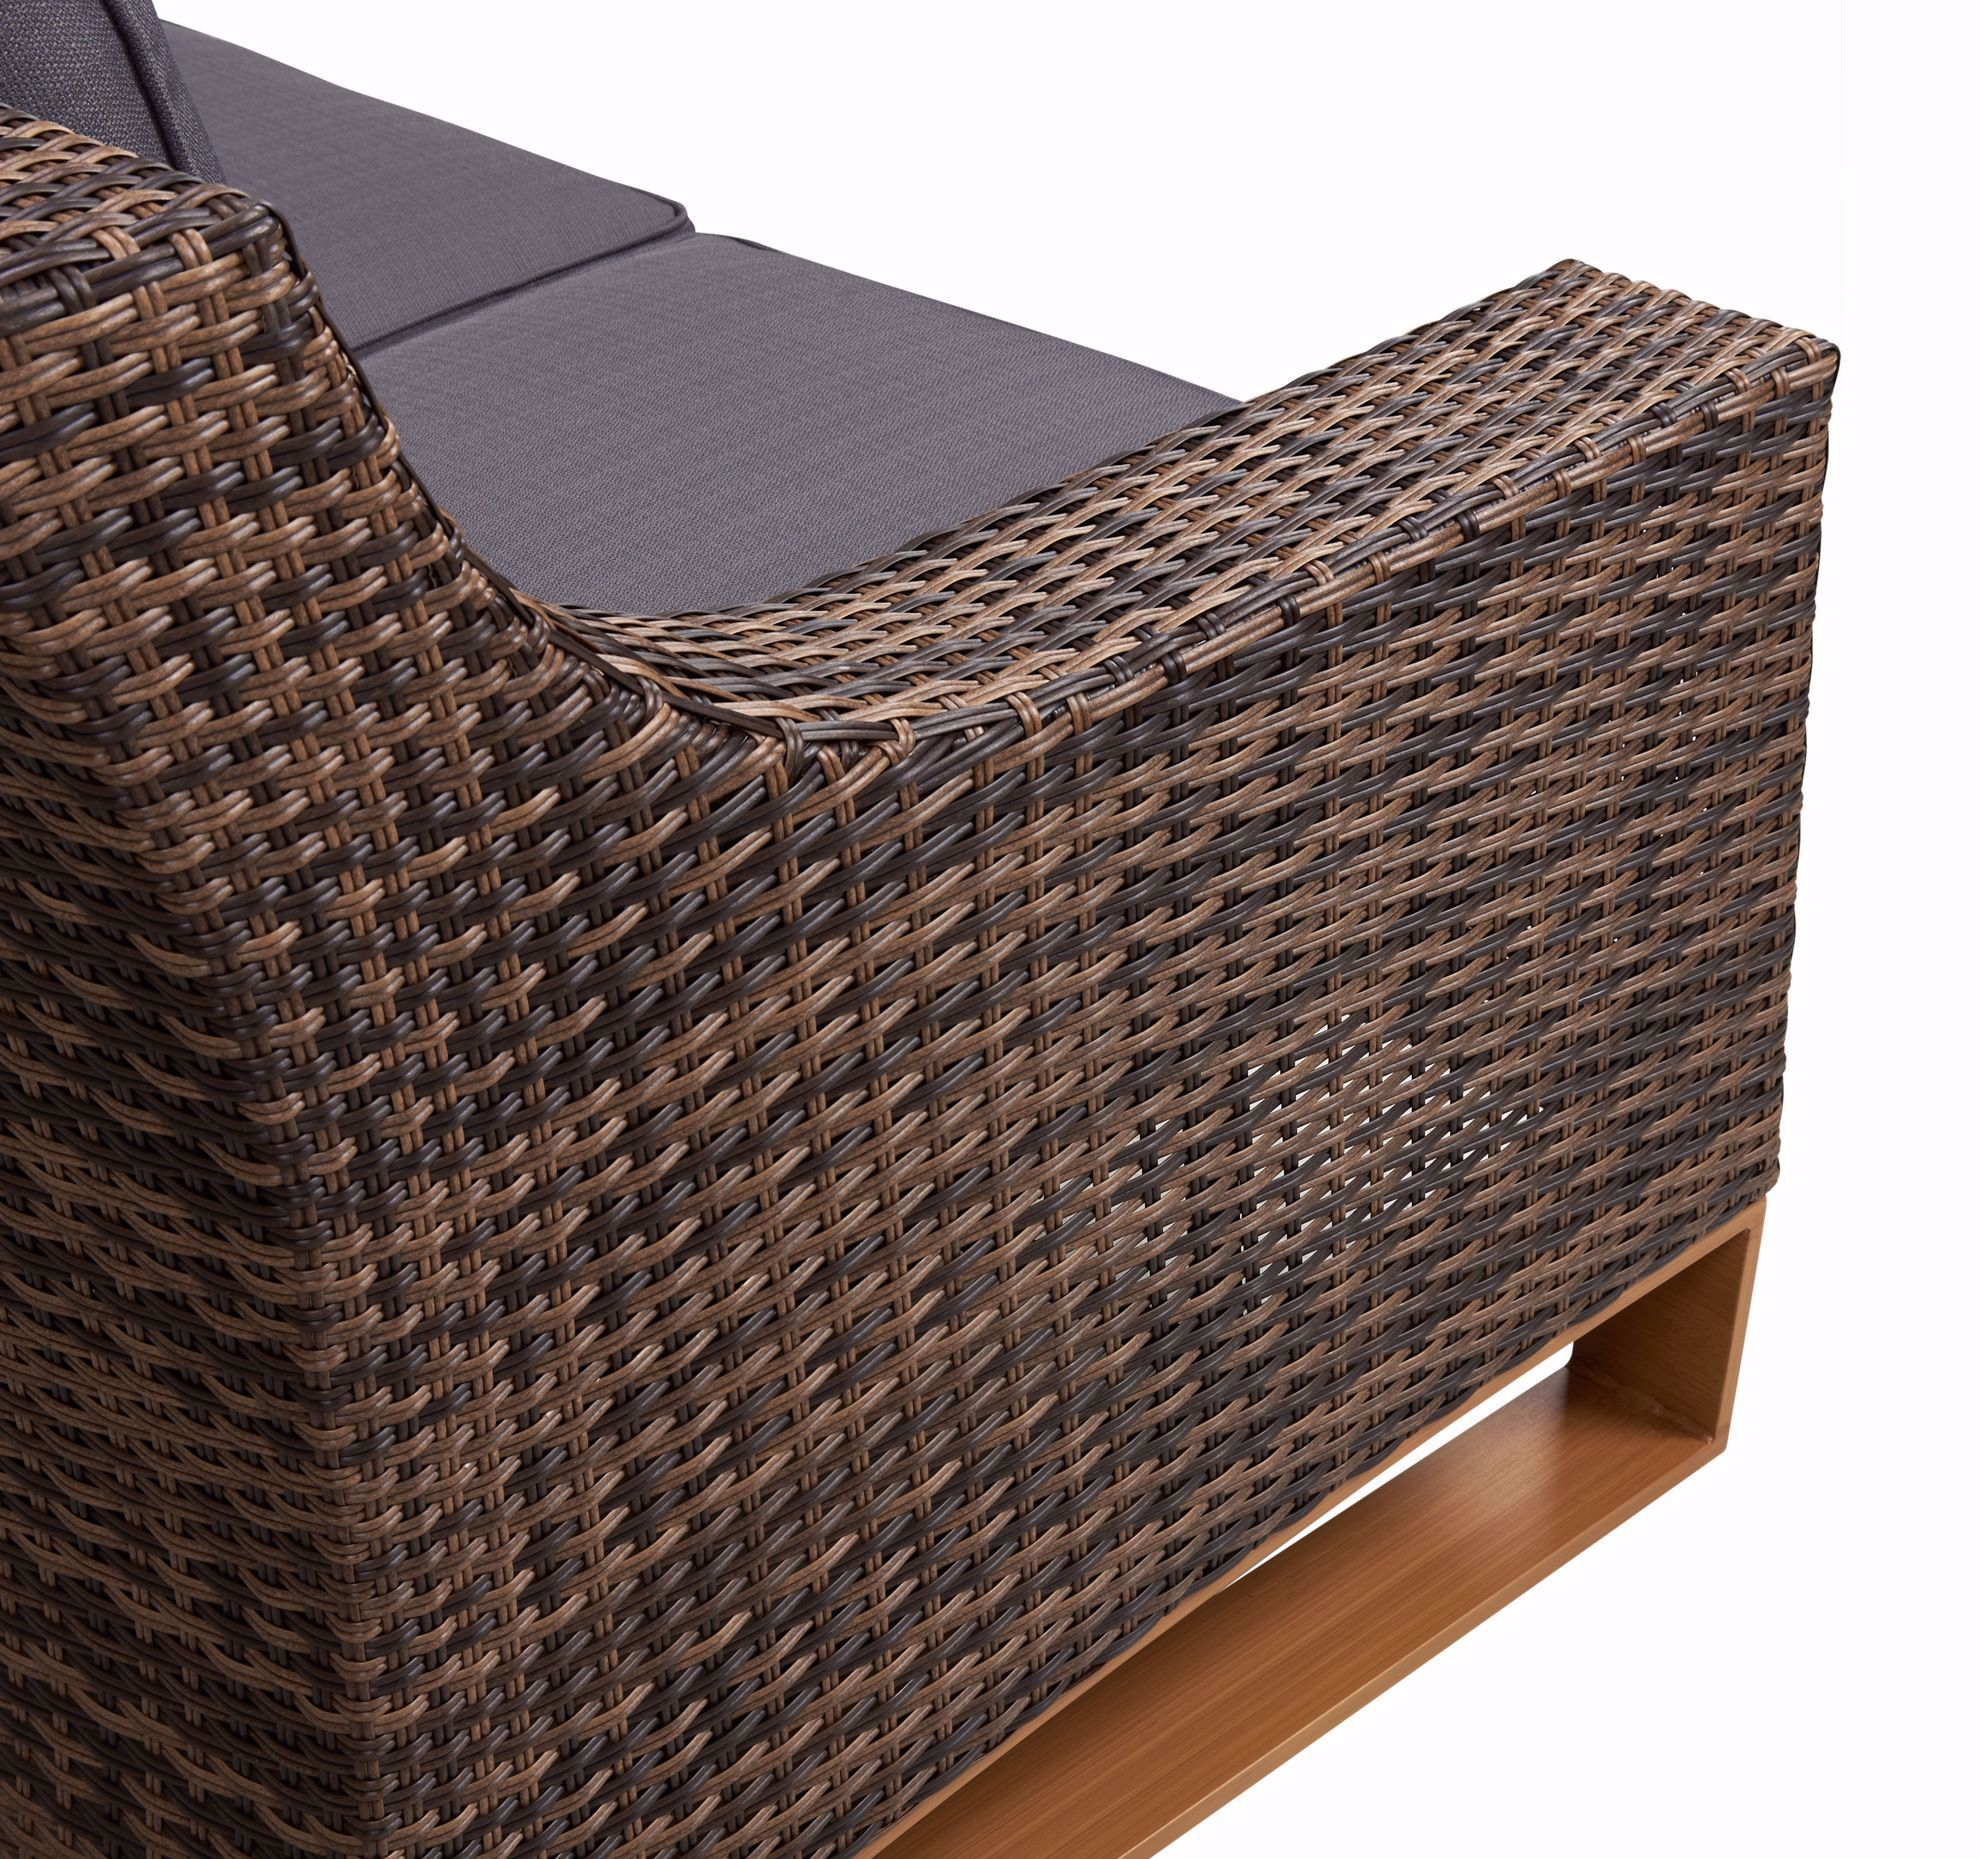 Picture of Shelton Cushion Sofa